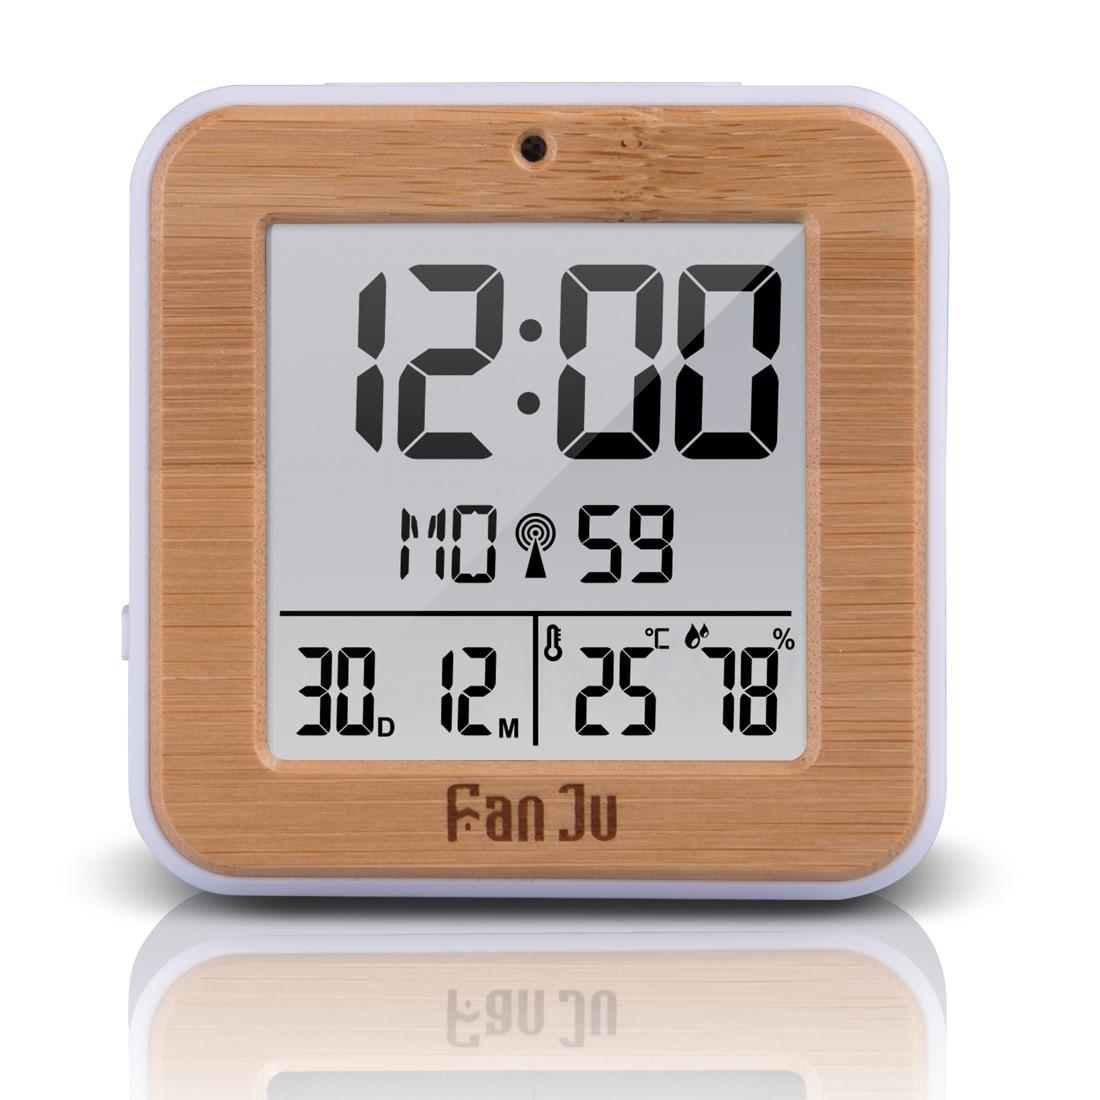 FanJu FJ3533 Digital Alarm Clock LED Table Clock Temperature Humidity Dual Alarm Auto Backlight Snooze Date Thermometer Display